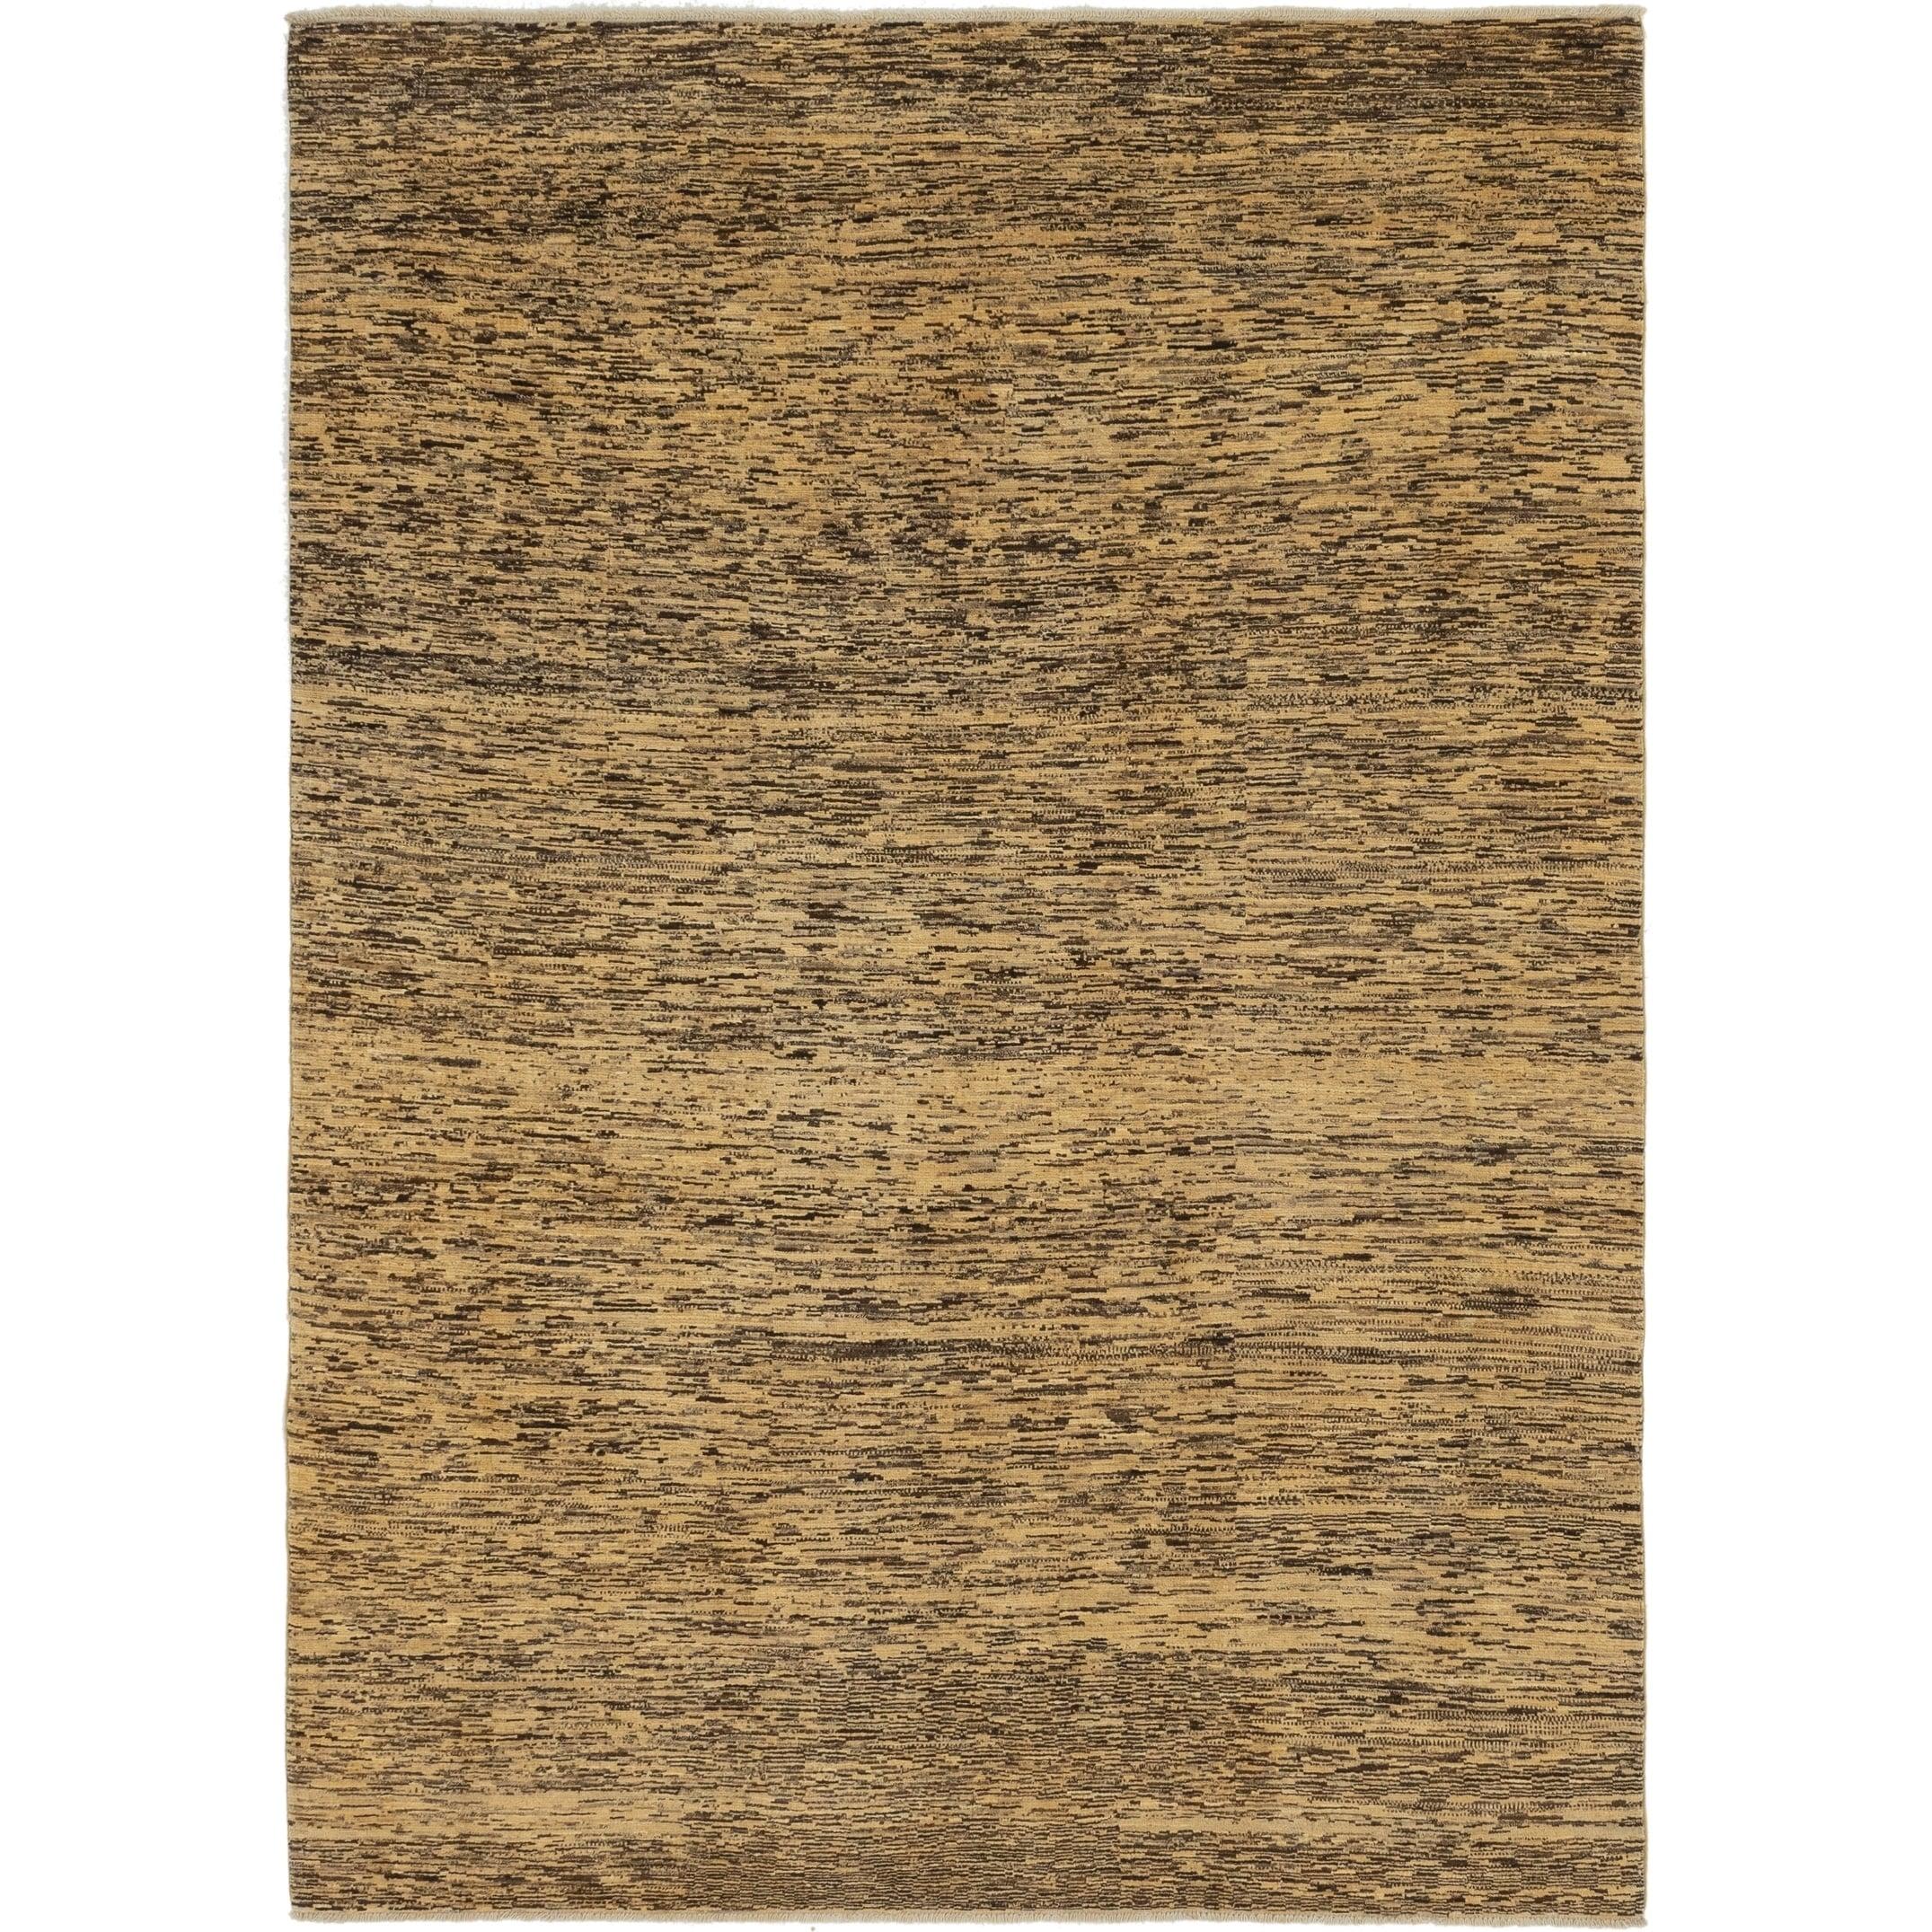 Hand Knotted Kashkuli Gabbeh Wool Area Rug - 6 4 x 8 8 (Multi - 6 4 x 8 8)